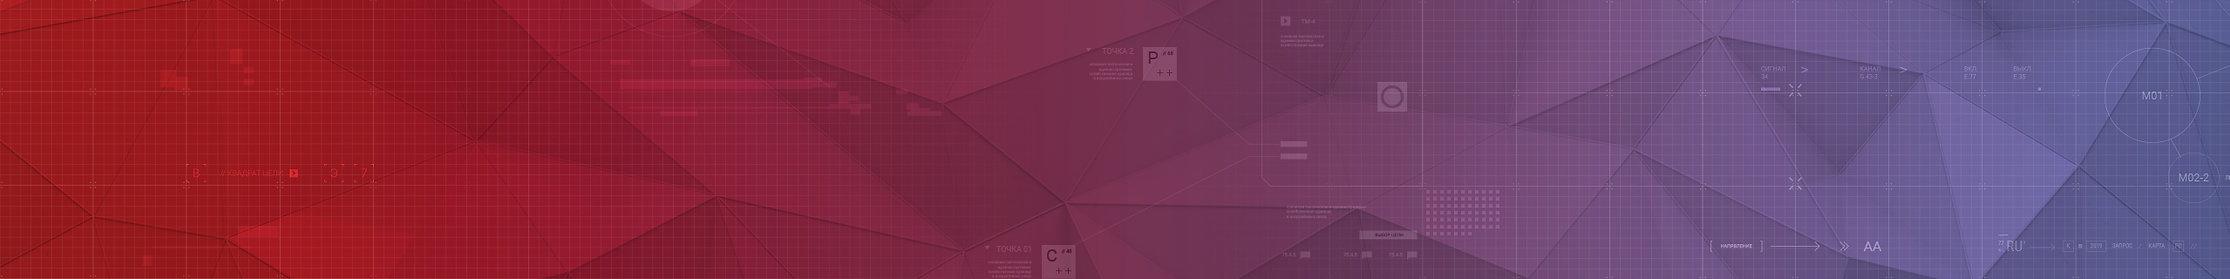 page-header-bg.jpg